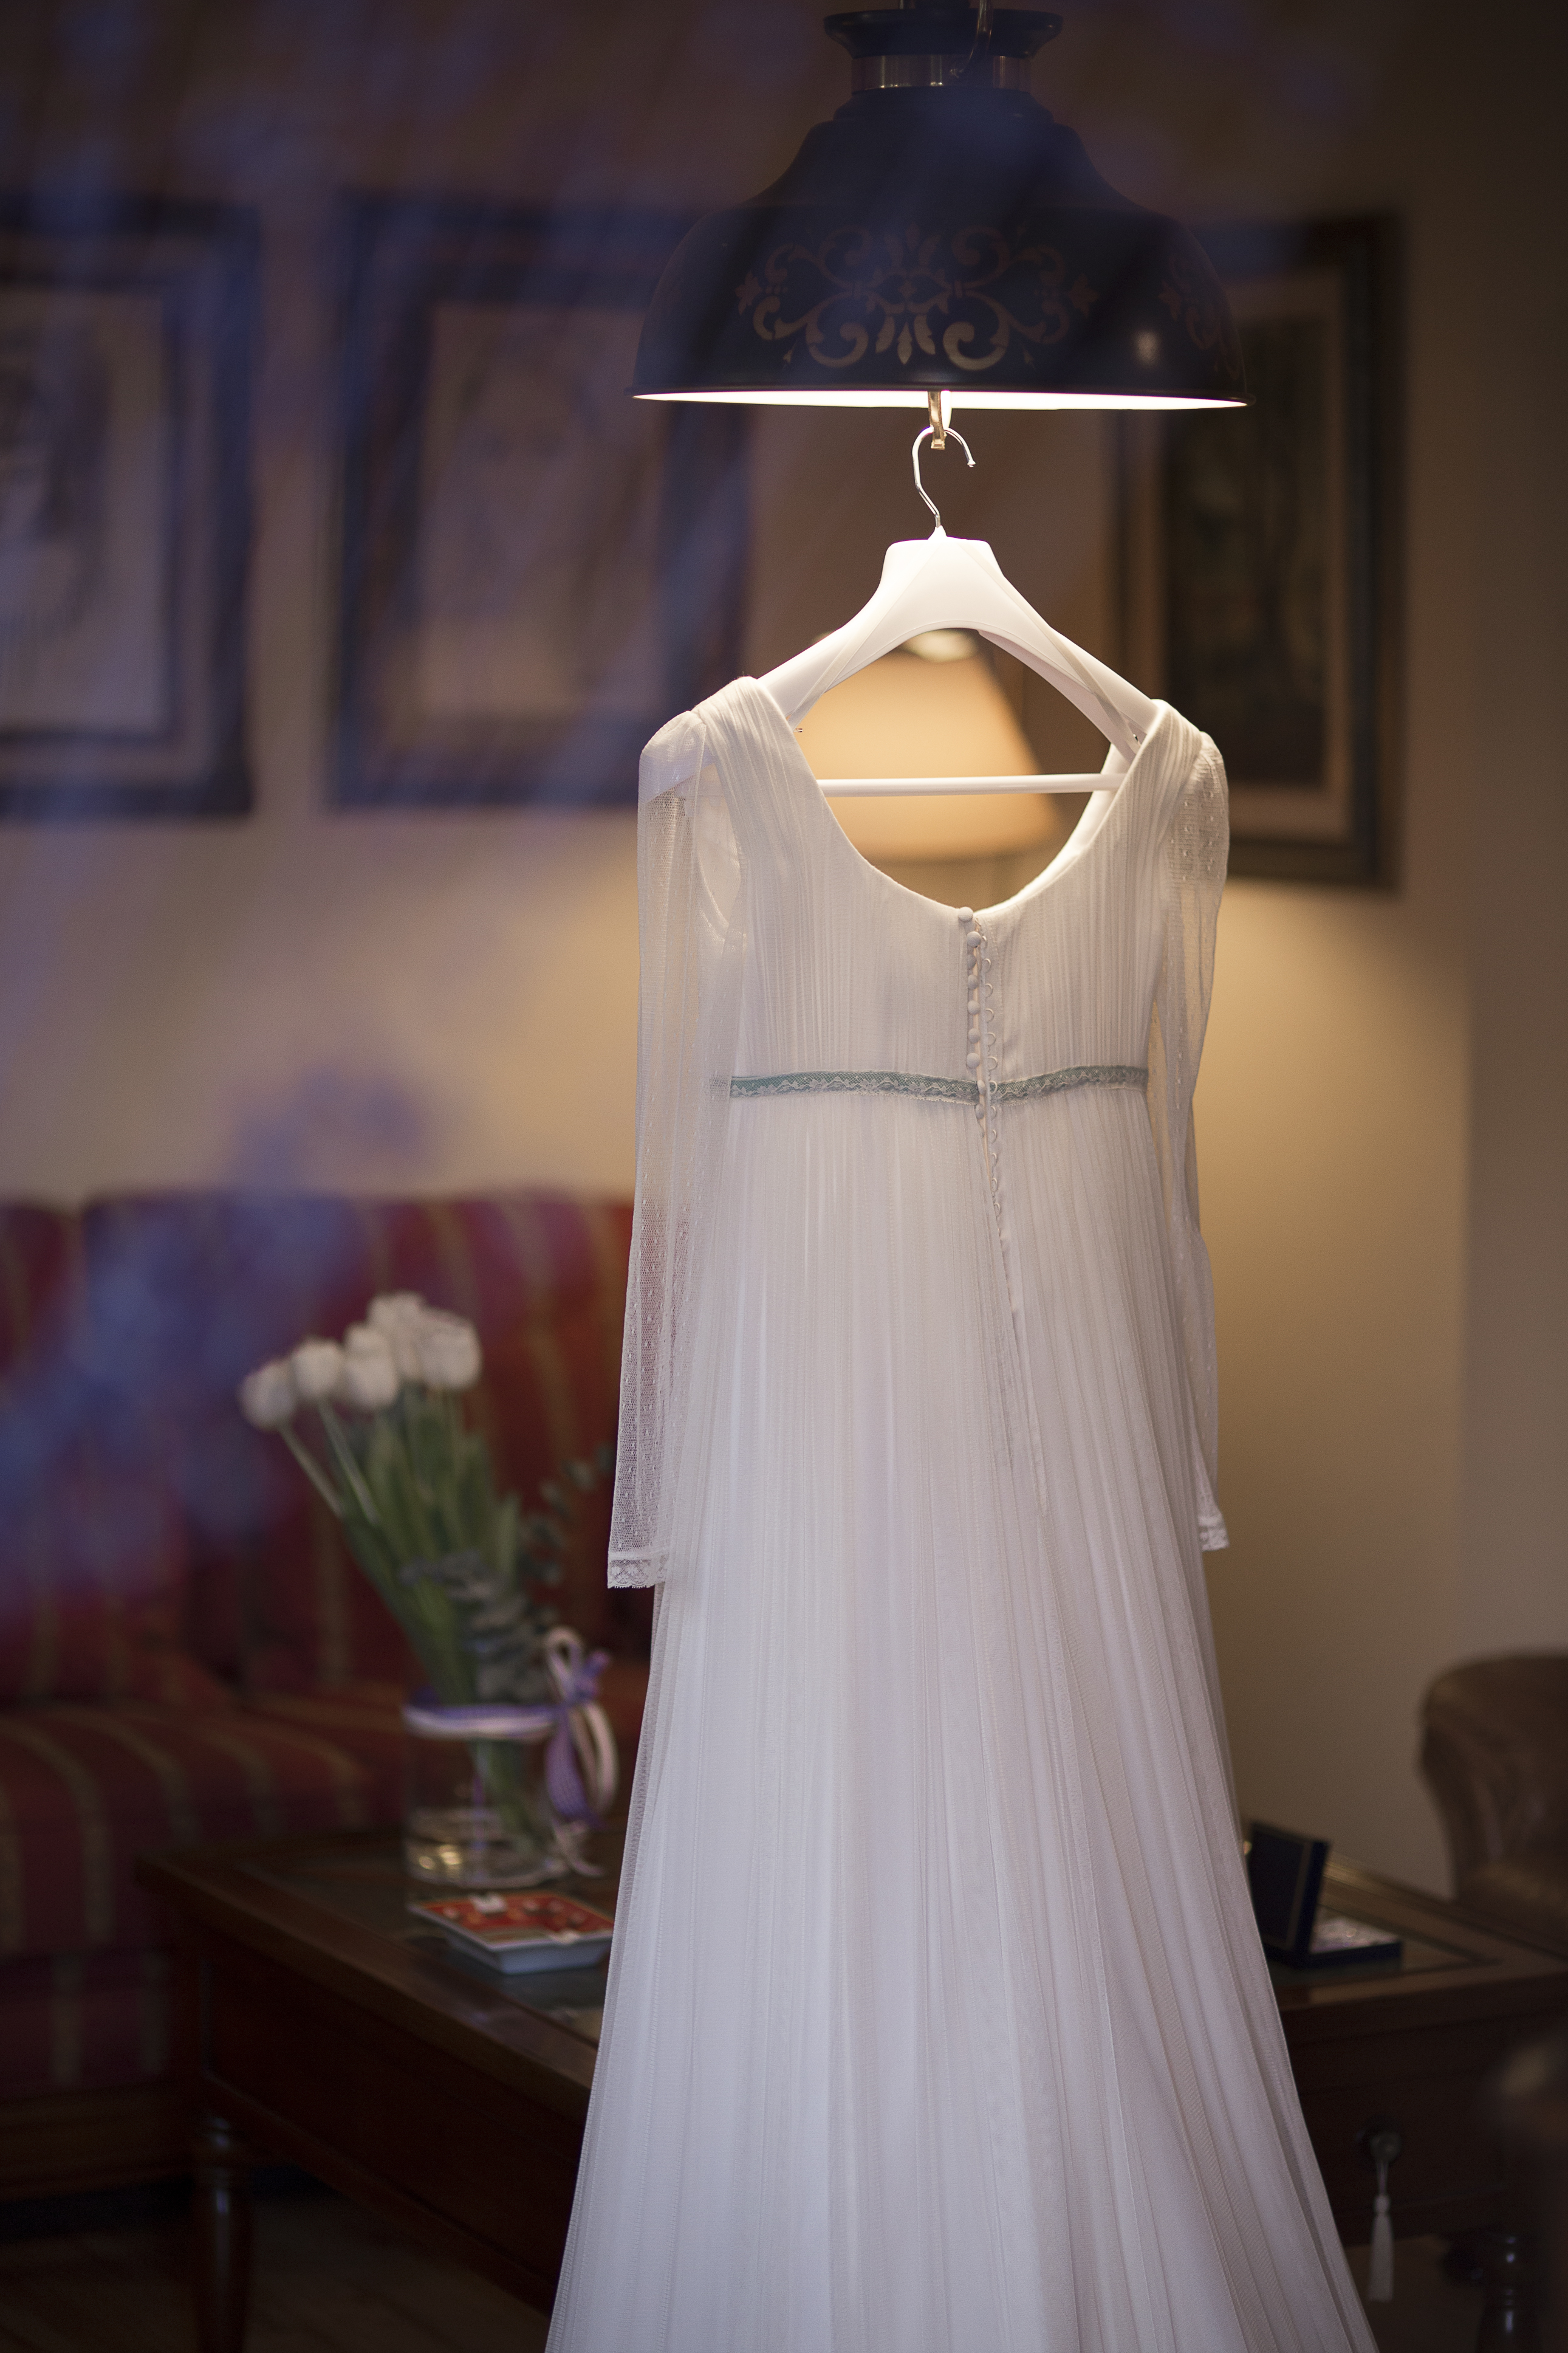 f0c43d4aa ¿Te gusta este vestido  ¡Compártelo!